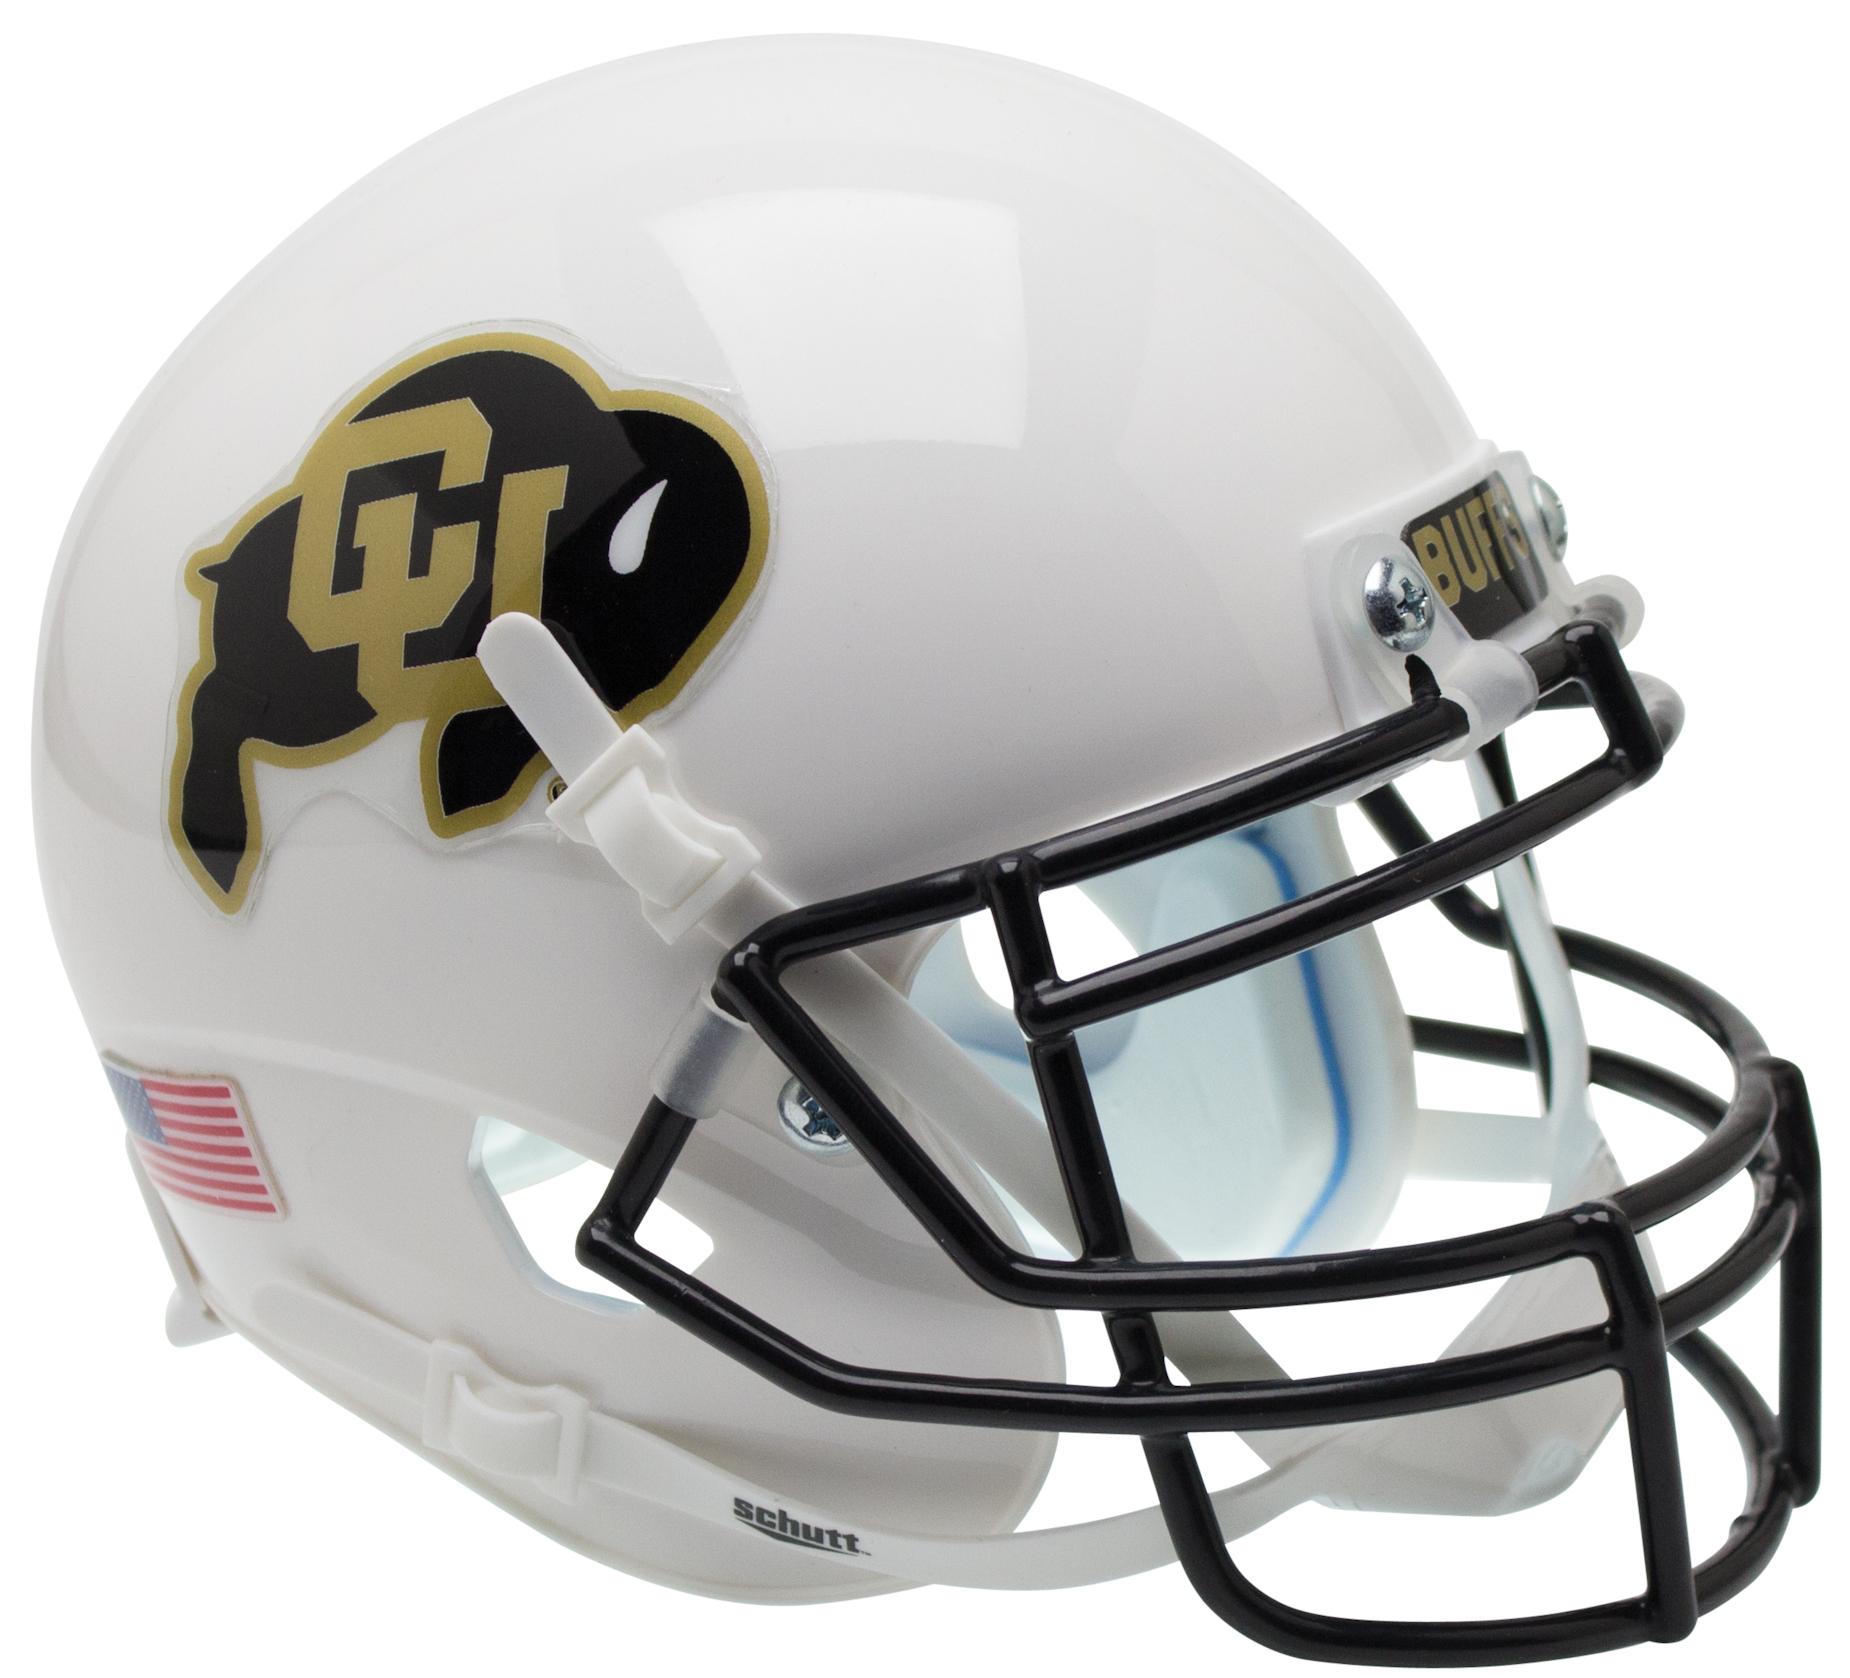 Colorado Buffaloes Authentic College XP Football Helmet Schutt <B>White</B>